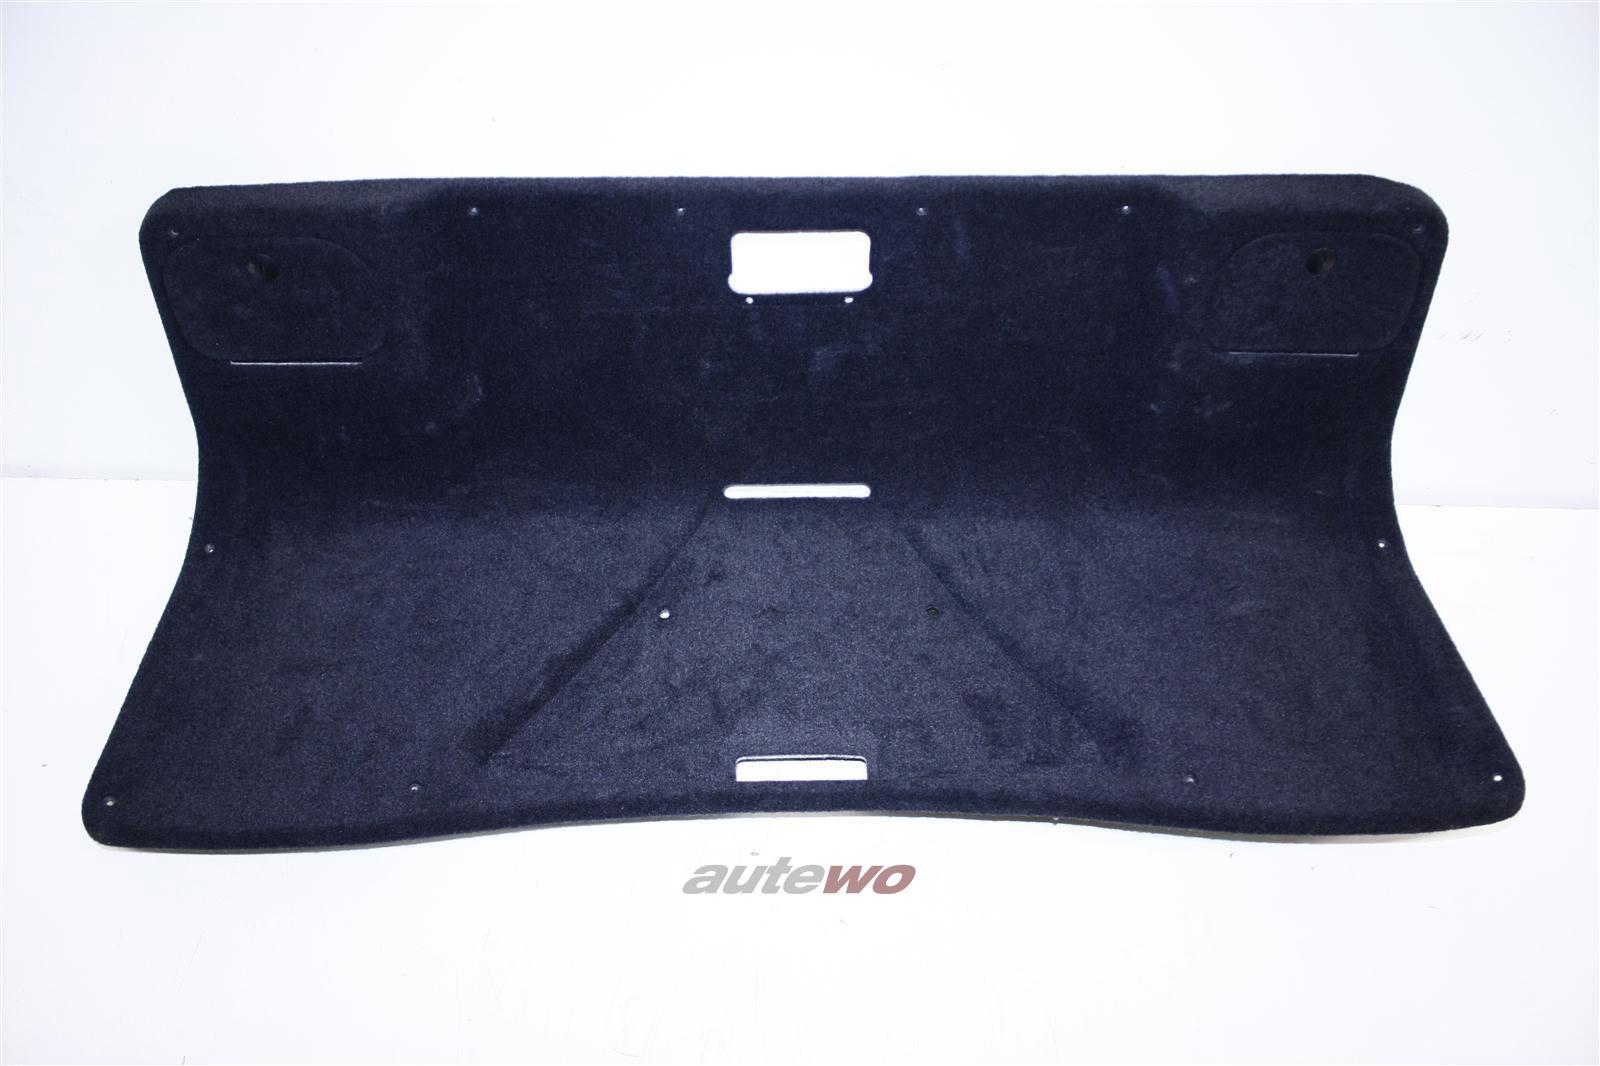 Audi A8 D2 Verkleidung Heckklappe V40 grau 4D0867975B